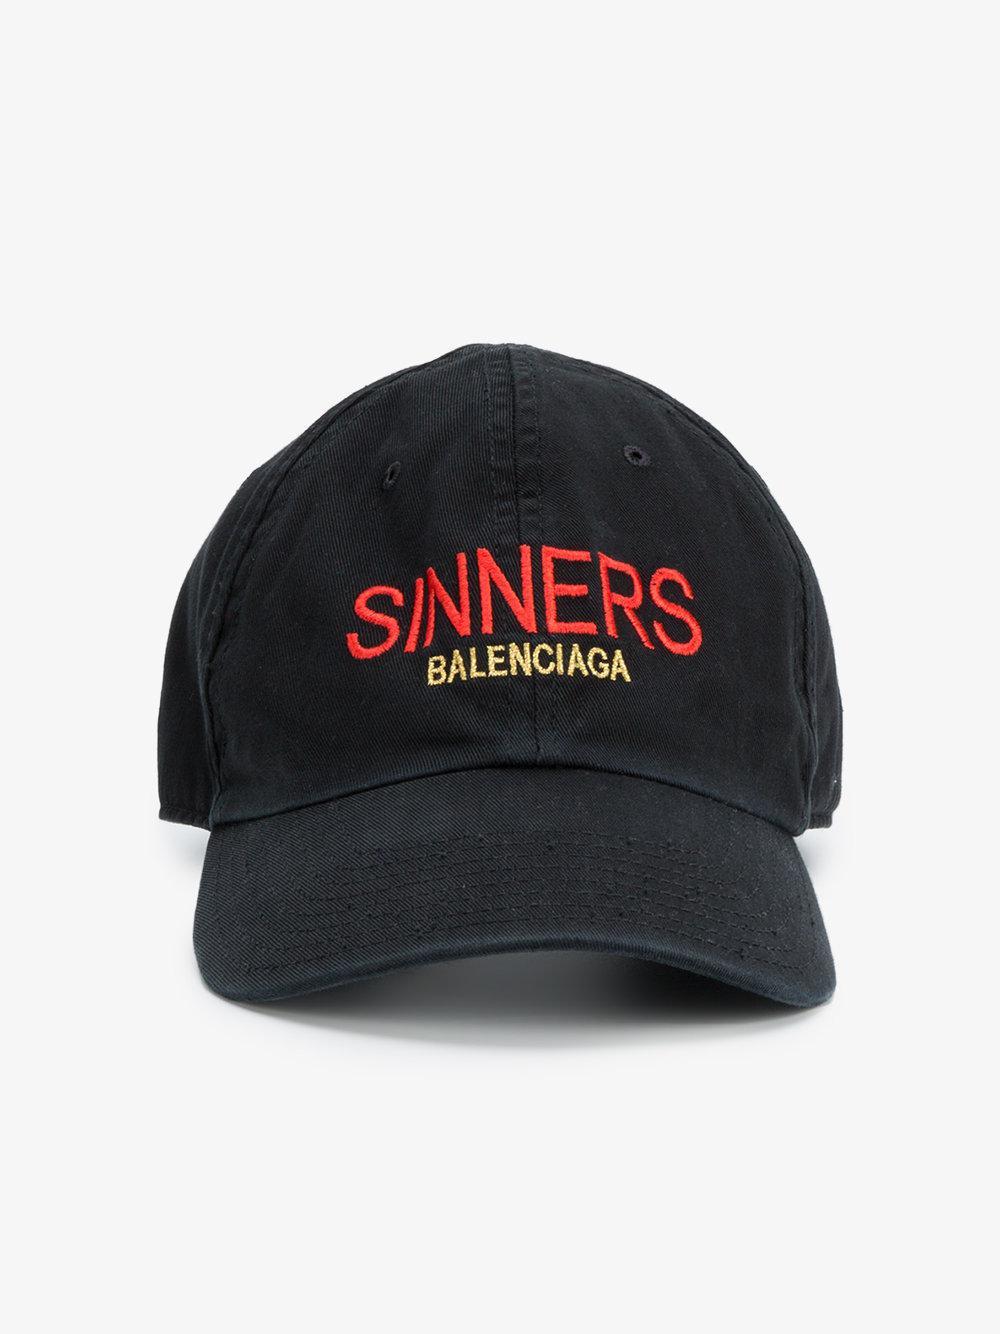 Sinners Embroidered Cotton-twill Baseball Cap Balenciaga njH9Uhow